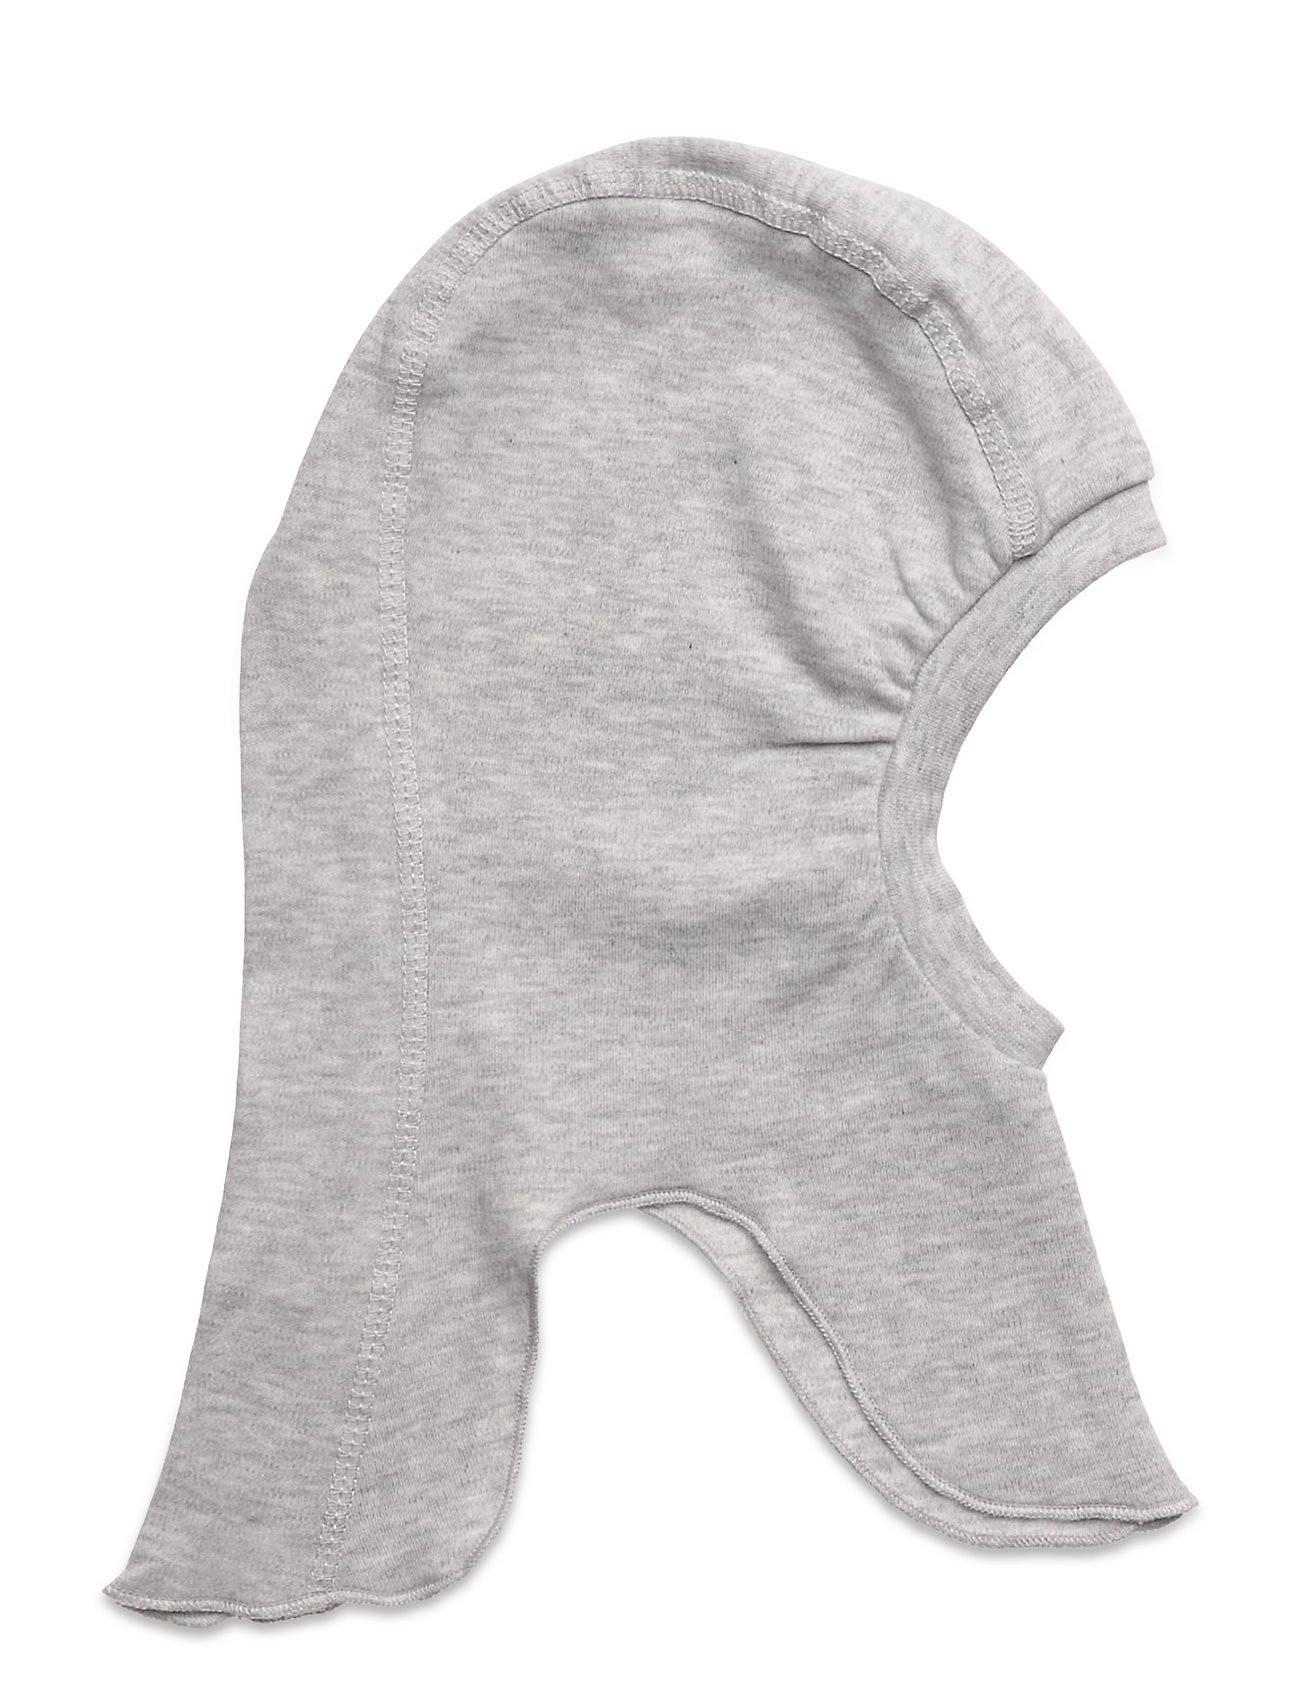 Balaclava Accessories Headwear Balaclava Grå Fixoni